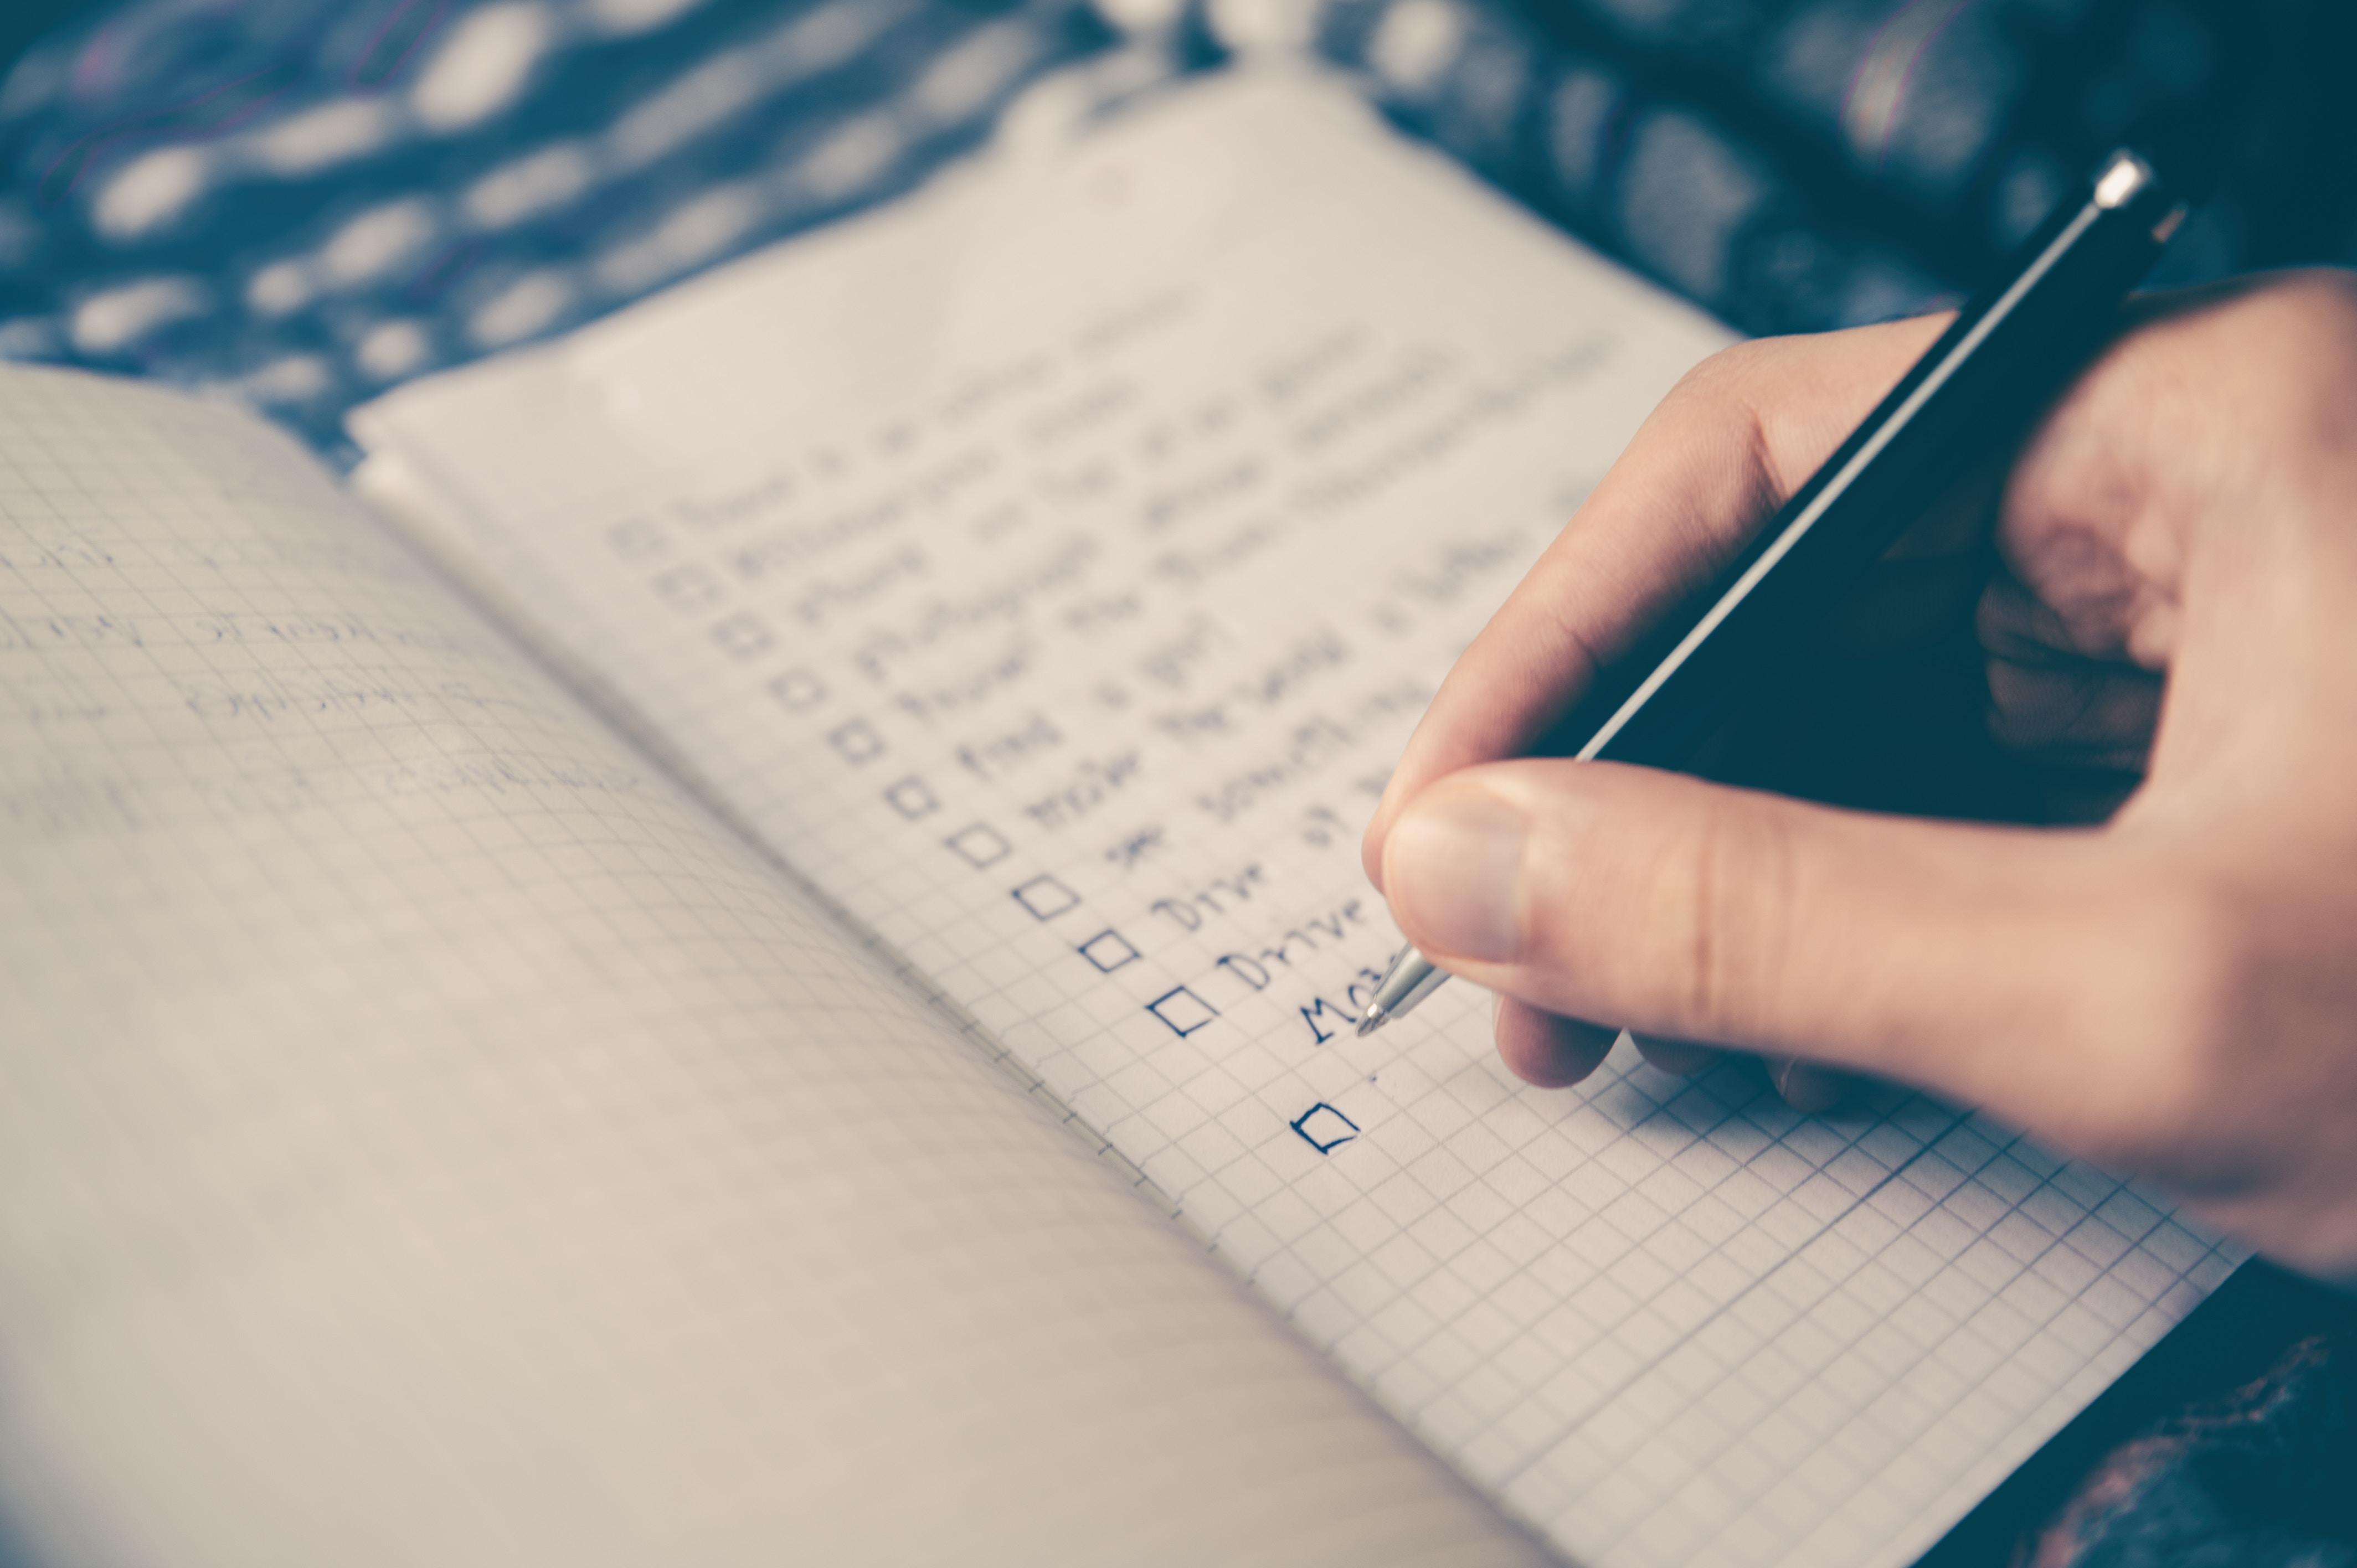 Making List by Glenn Carstens-Peters on Unsplash